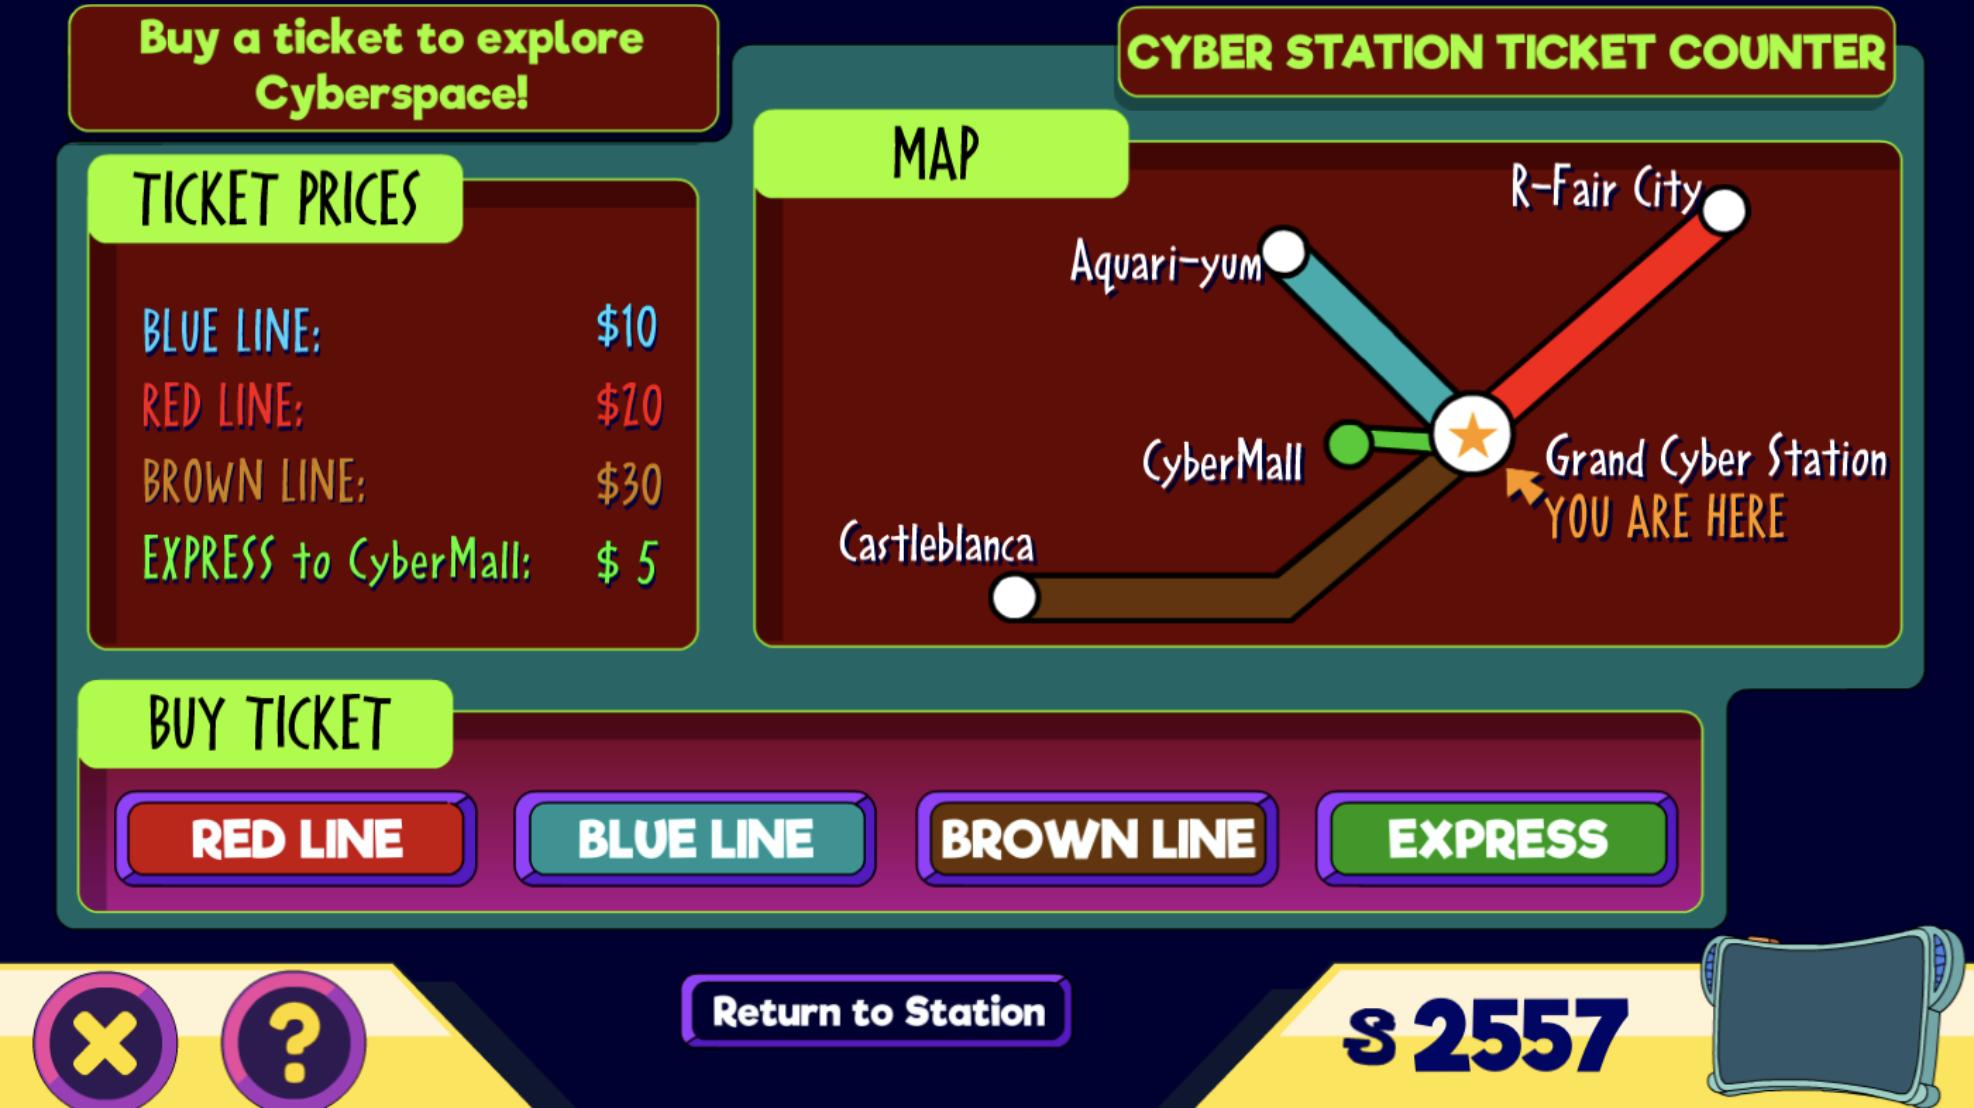 Cyber Station